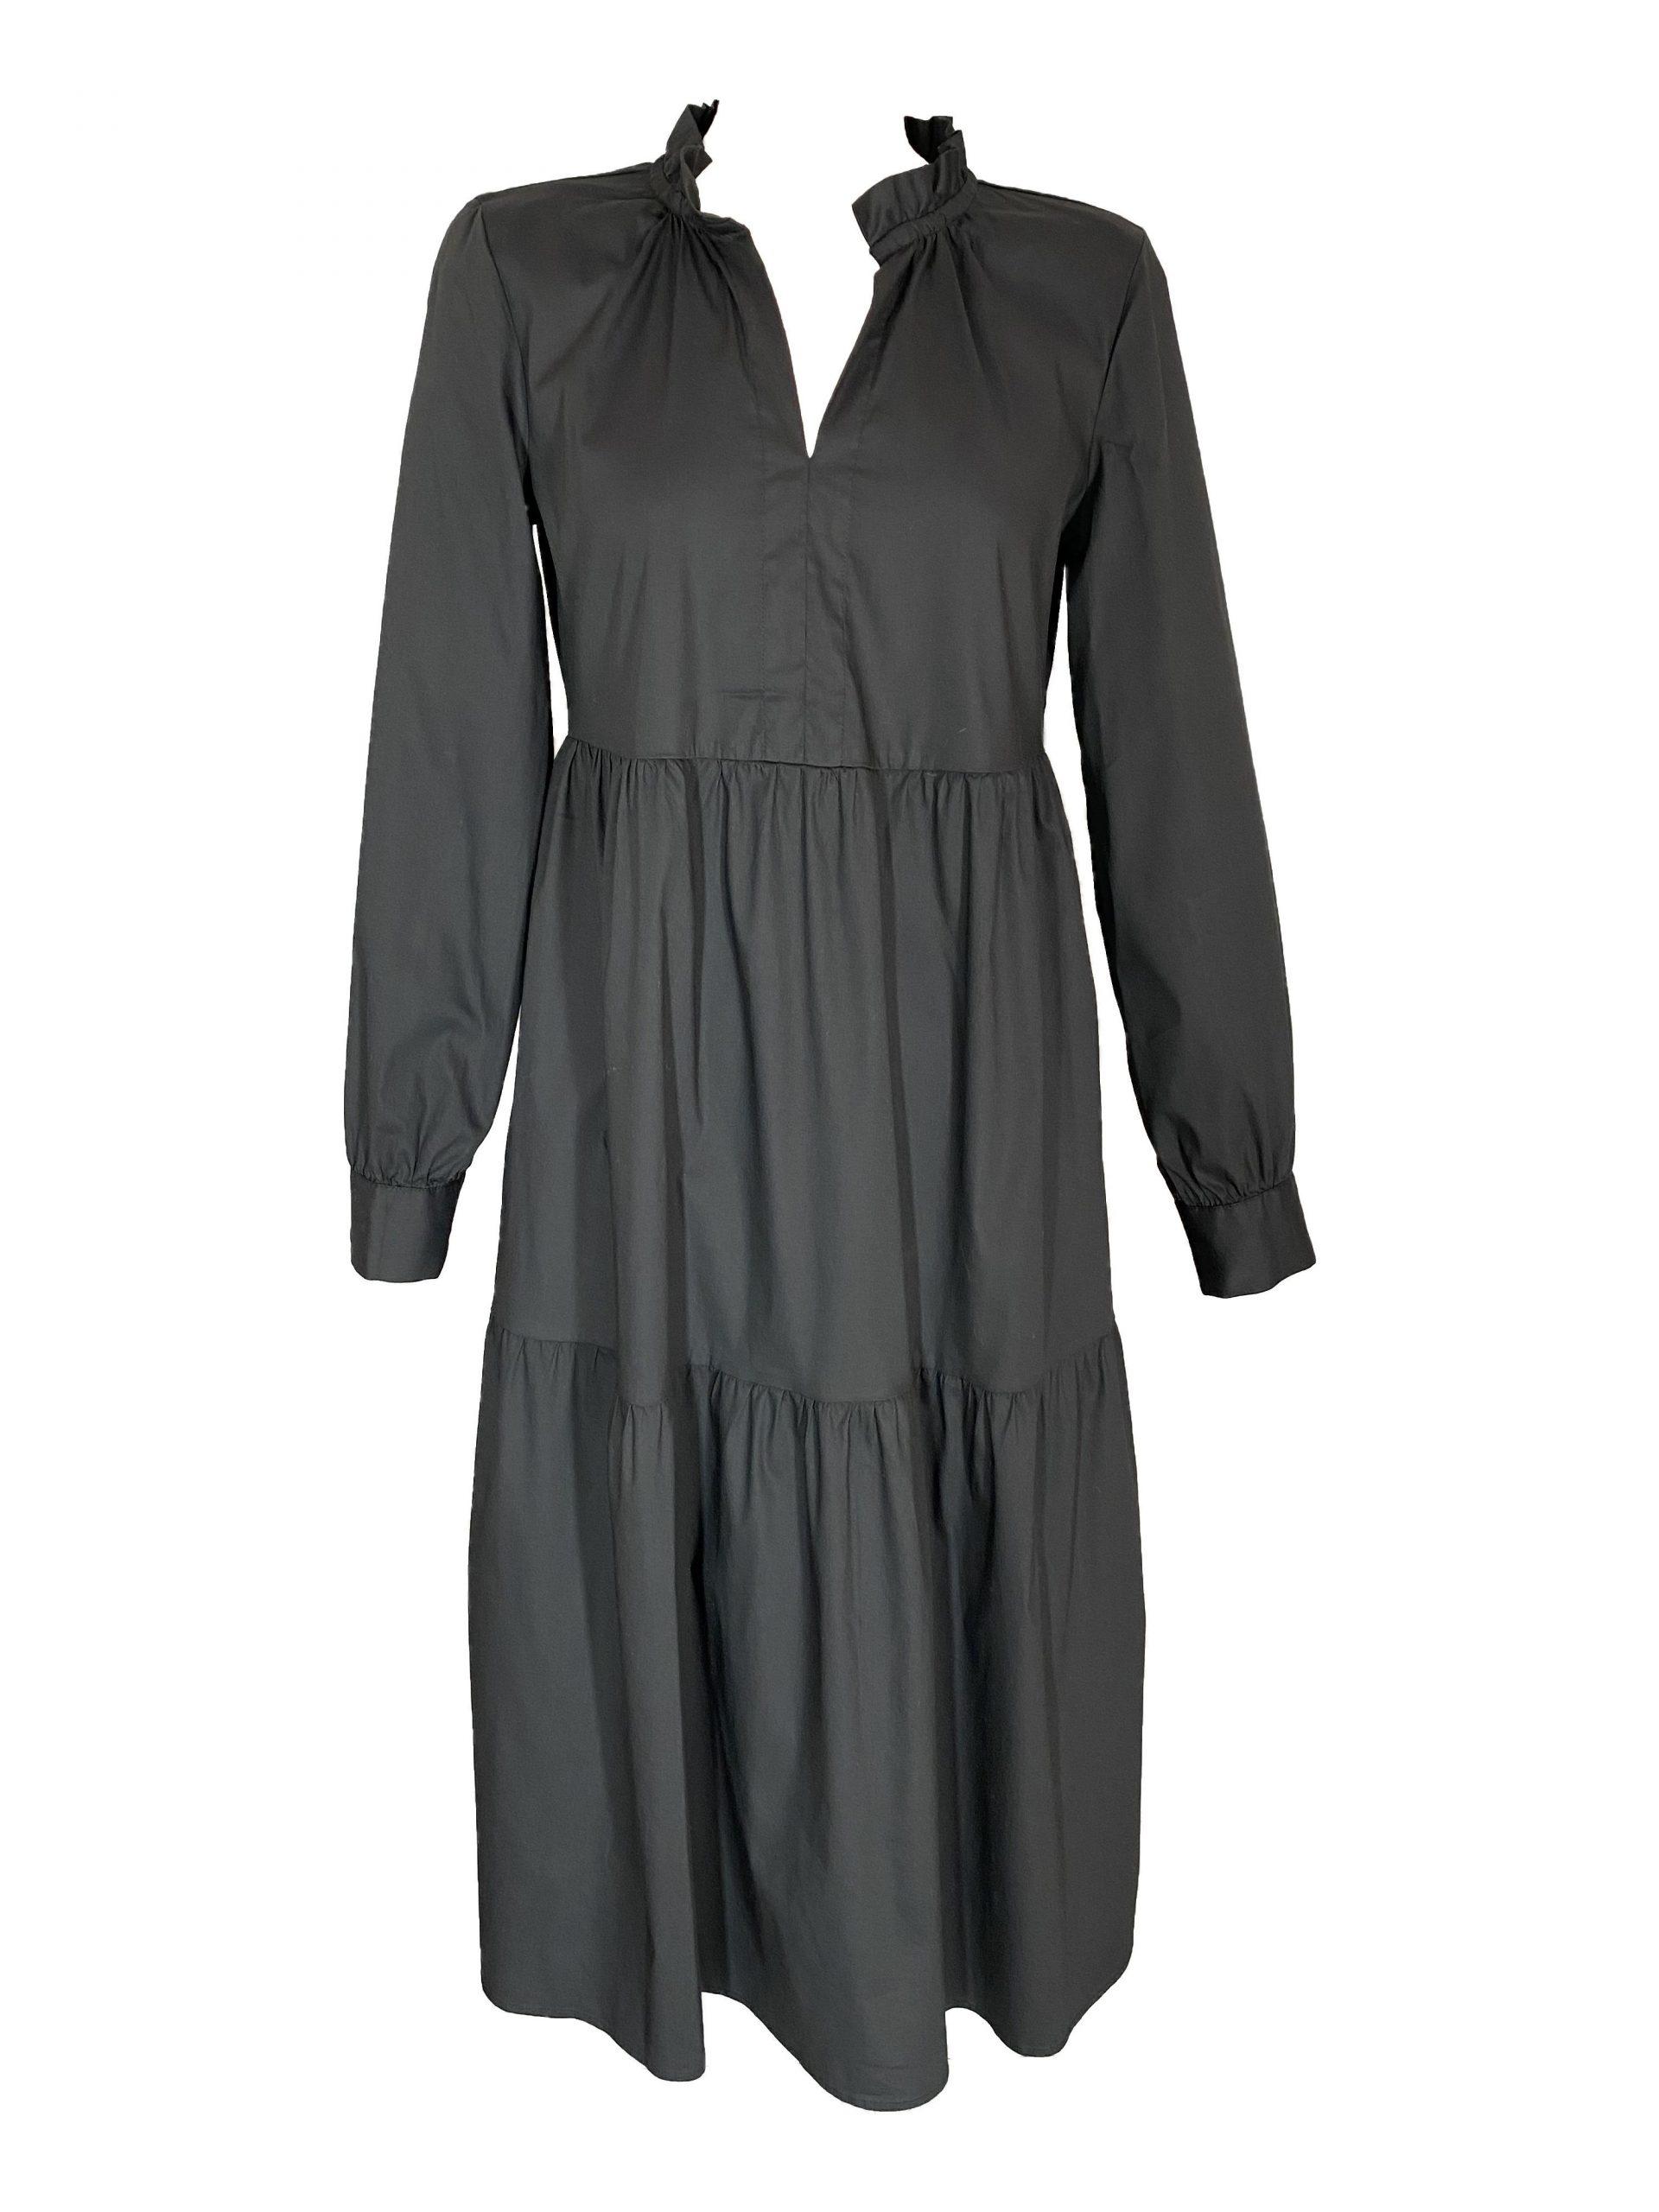 Stufenkleid Maxi 4890152190  Damen  Mode  Bader